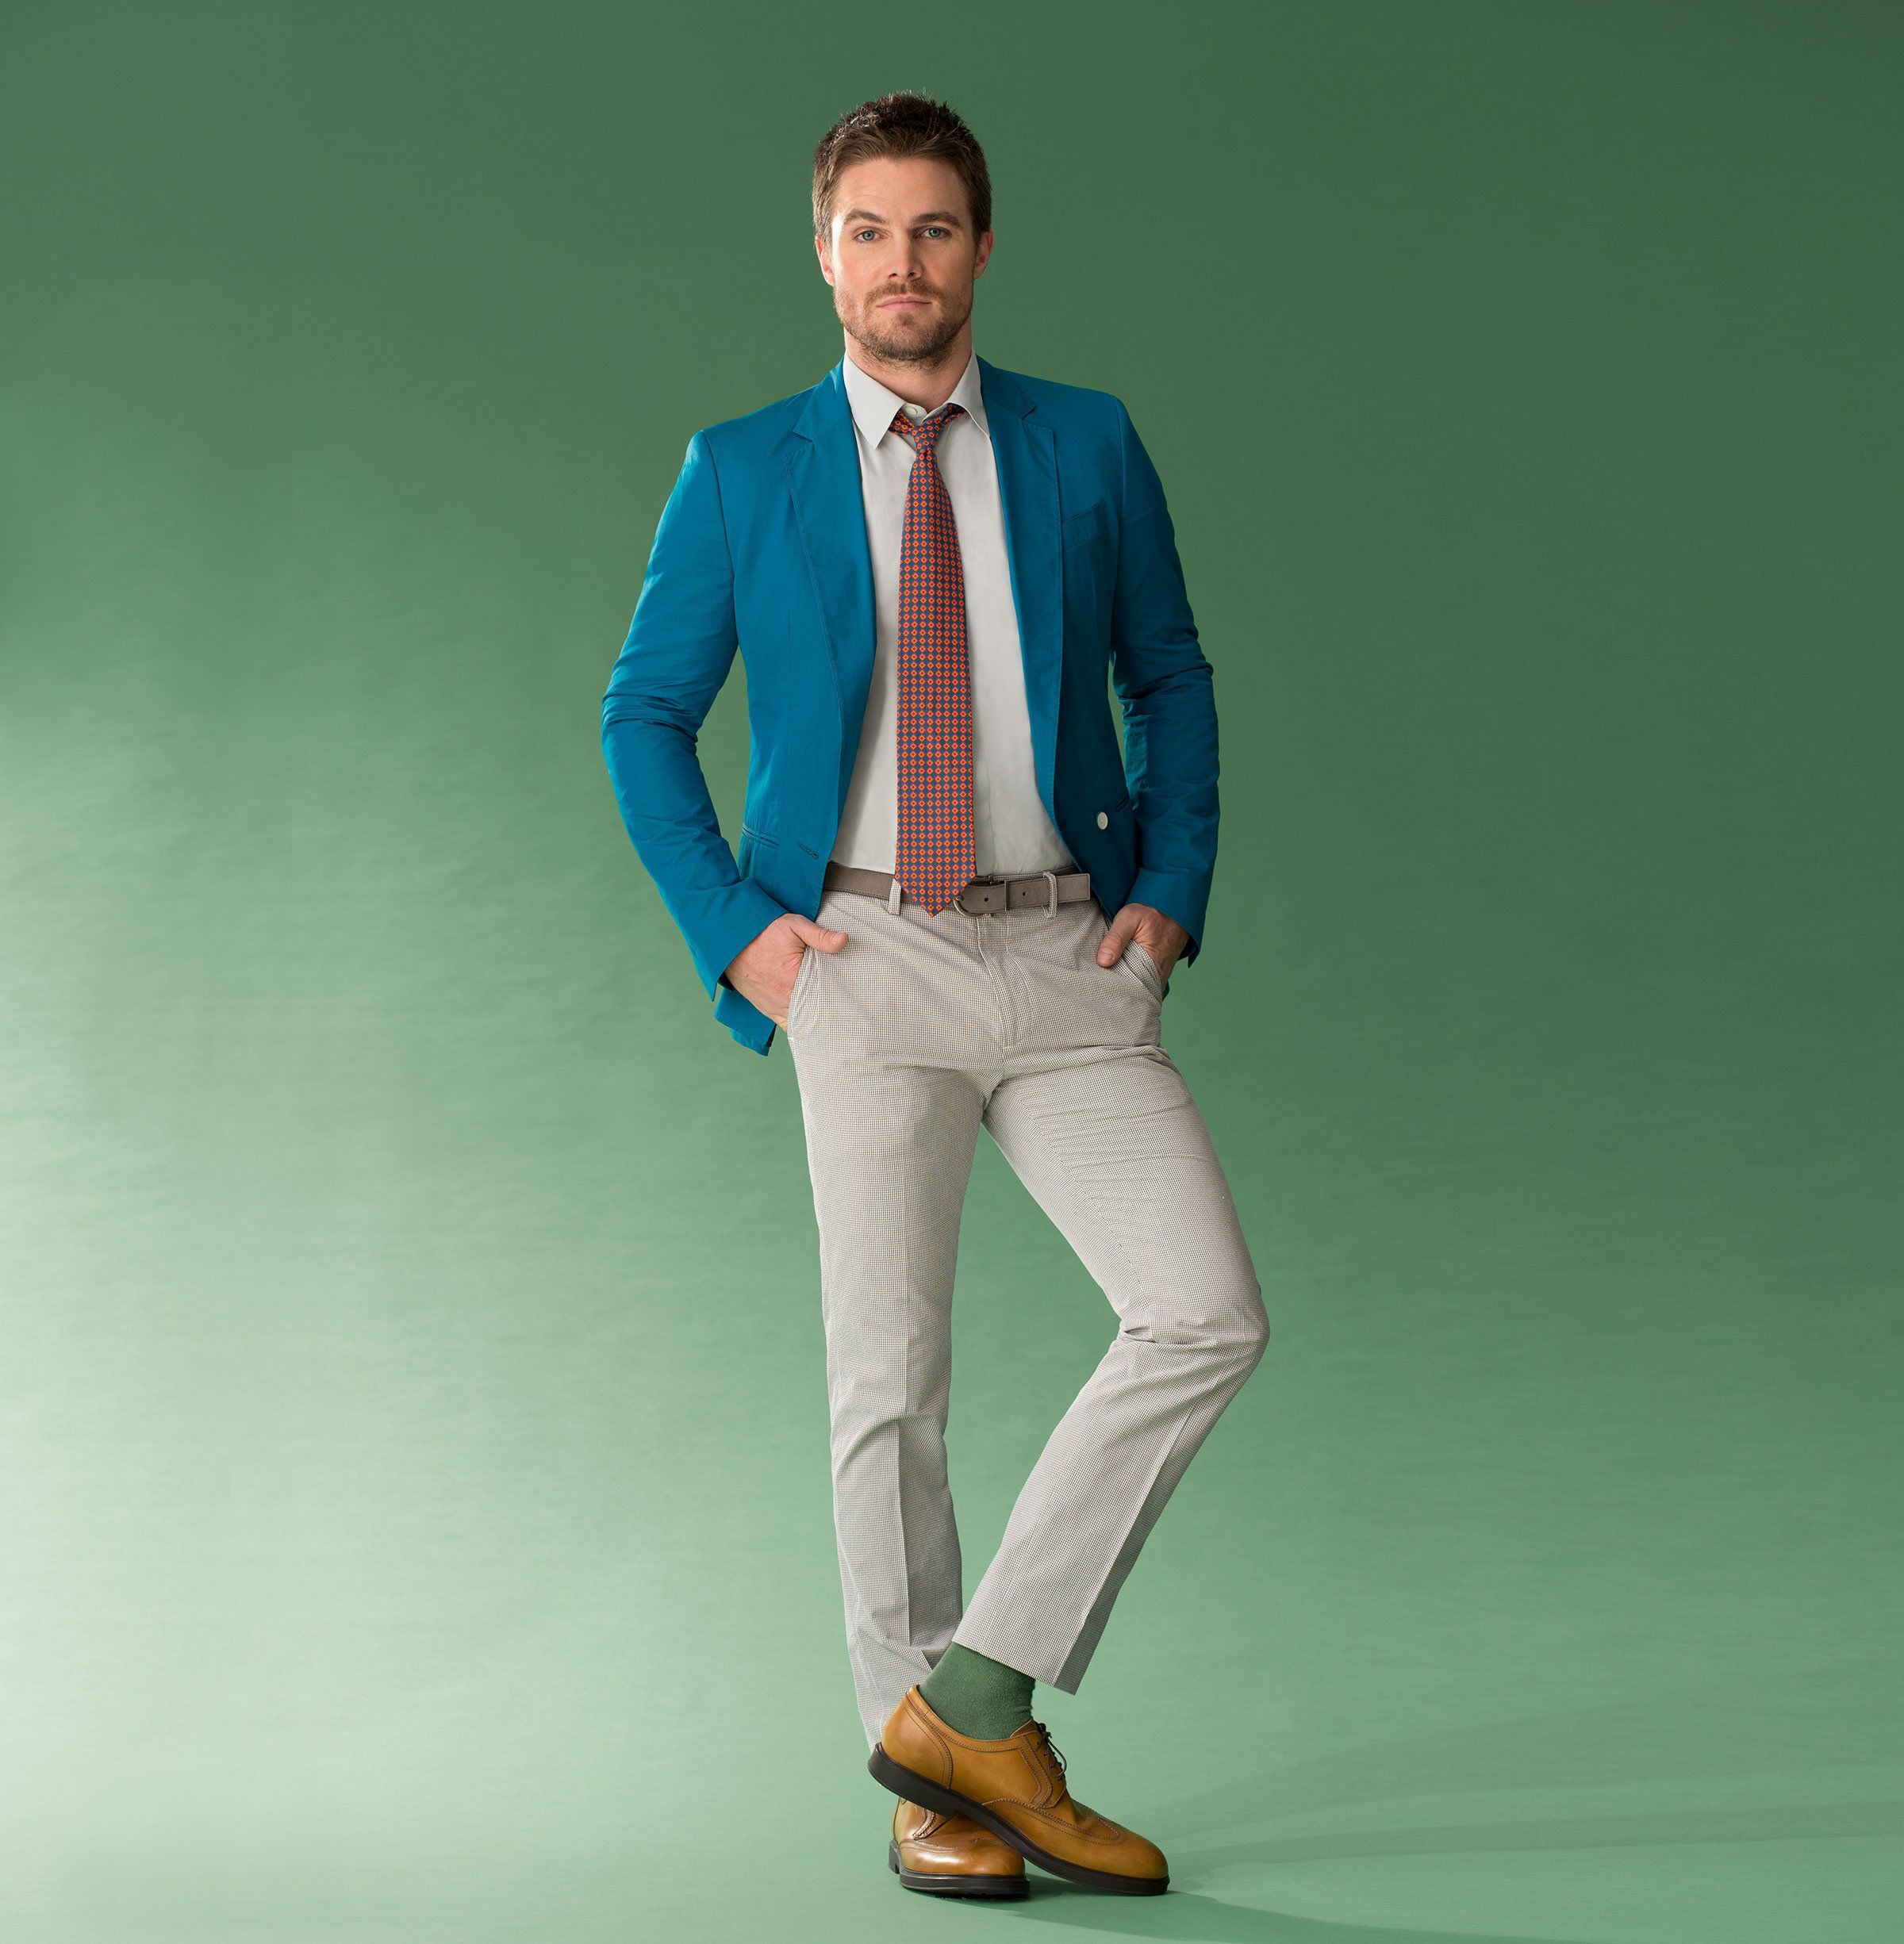 Actor Stephen Amell modeling a designer suit.